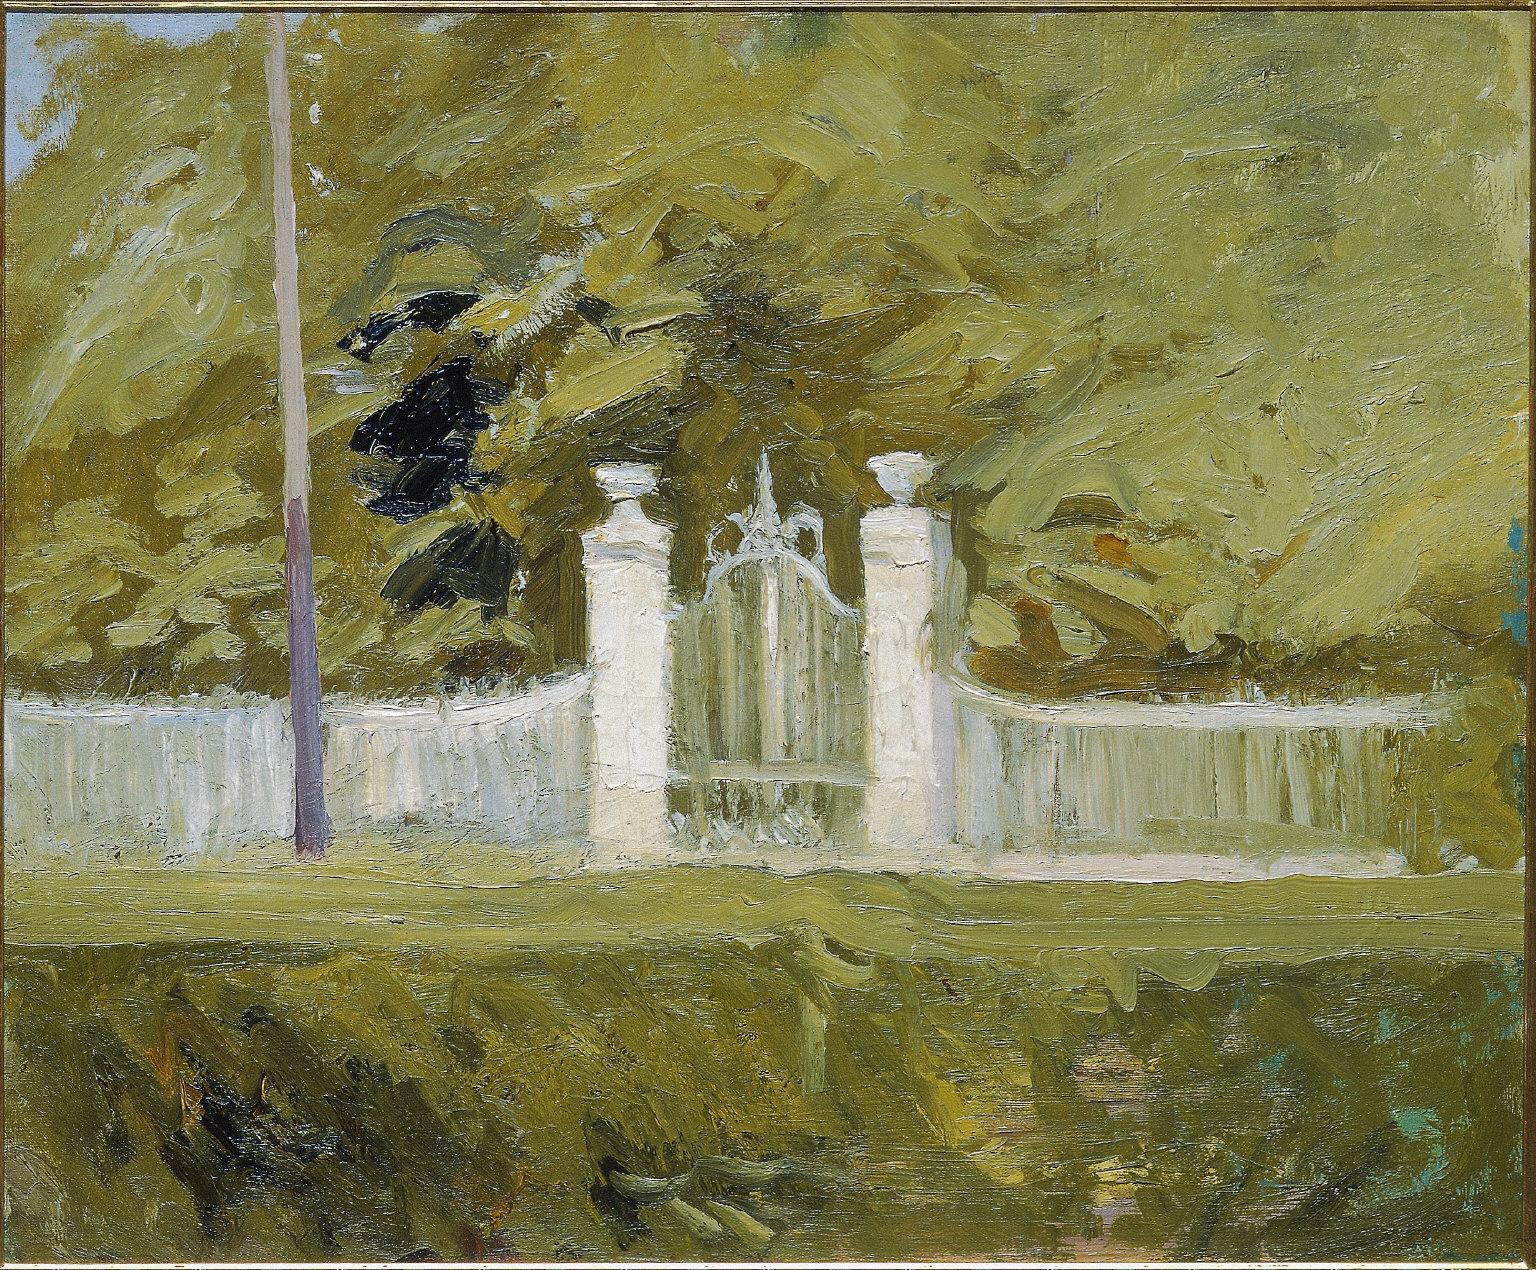 Gateway and Fence, Saint-Cloud